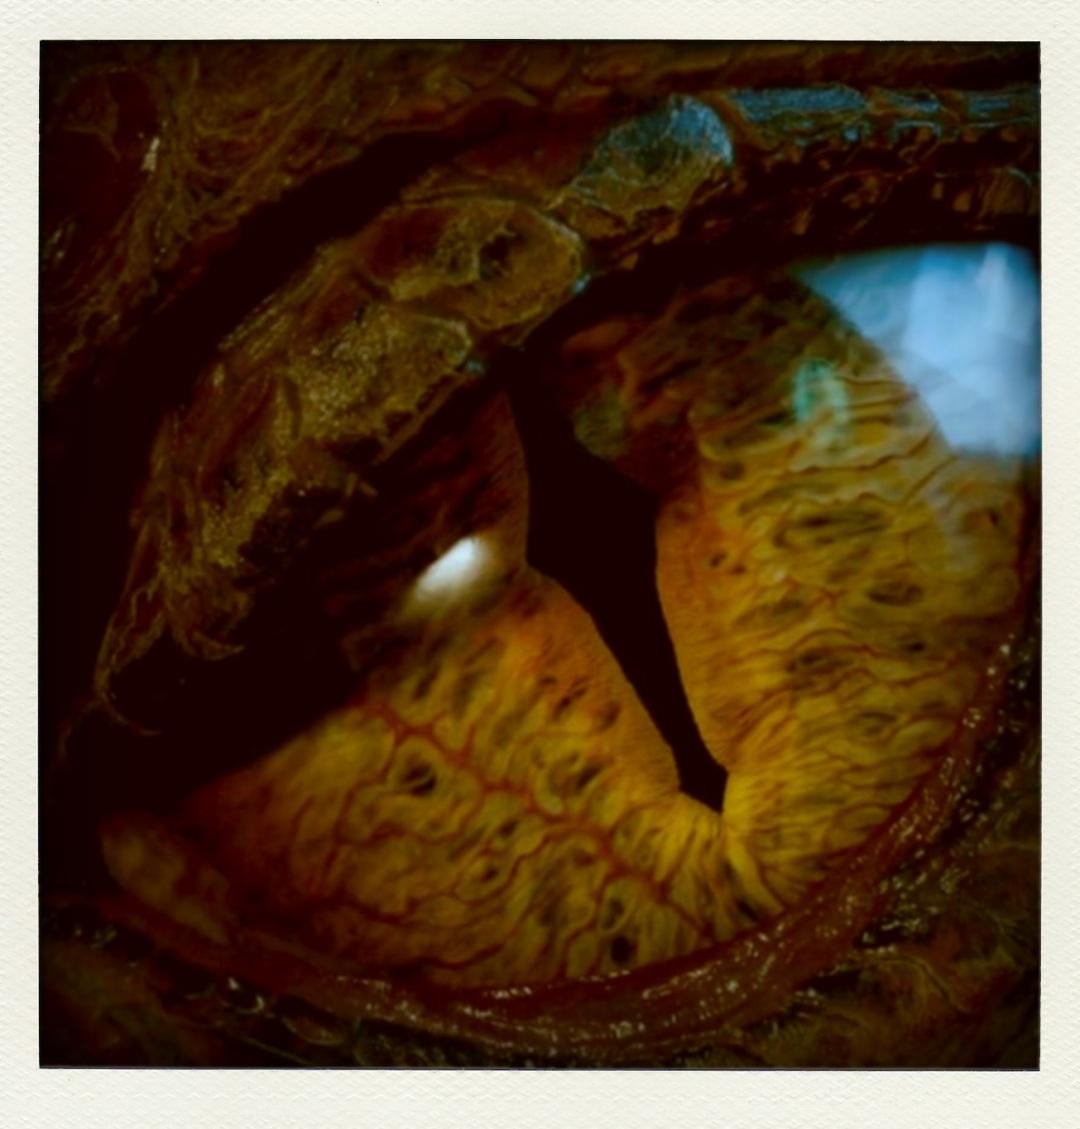 The Hobbit: The Desolation of Smaug @ www.cinemascream.co.uk